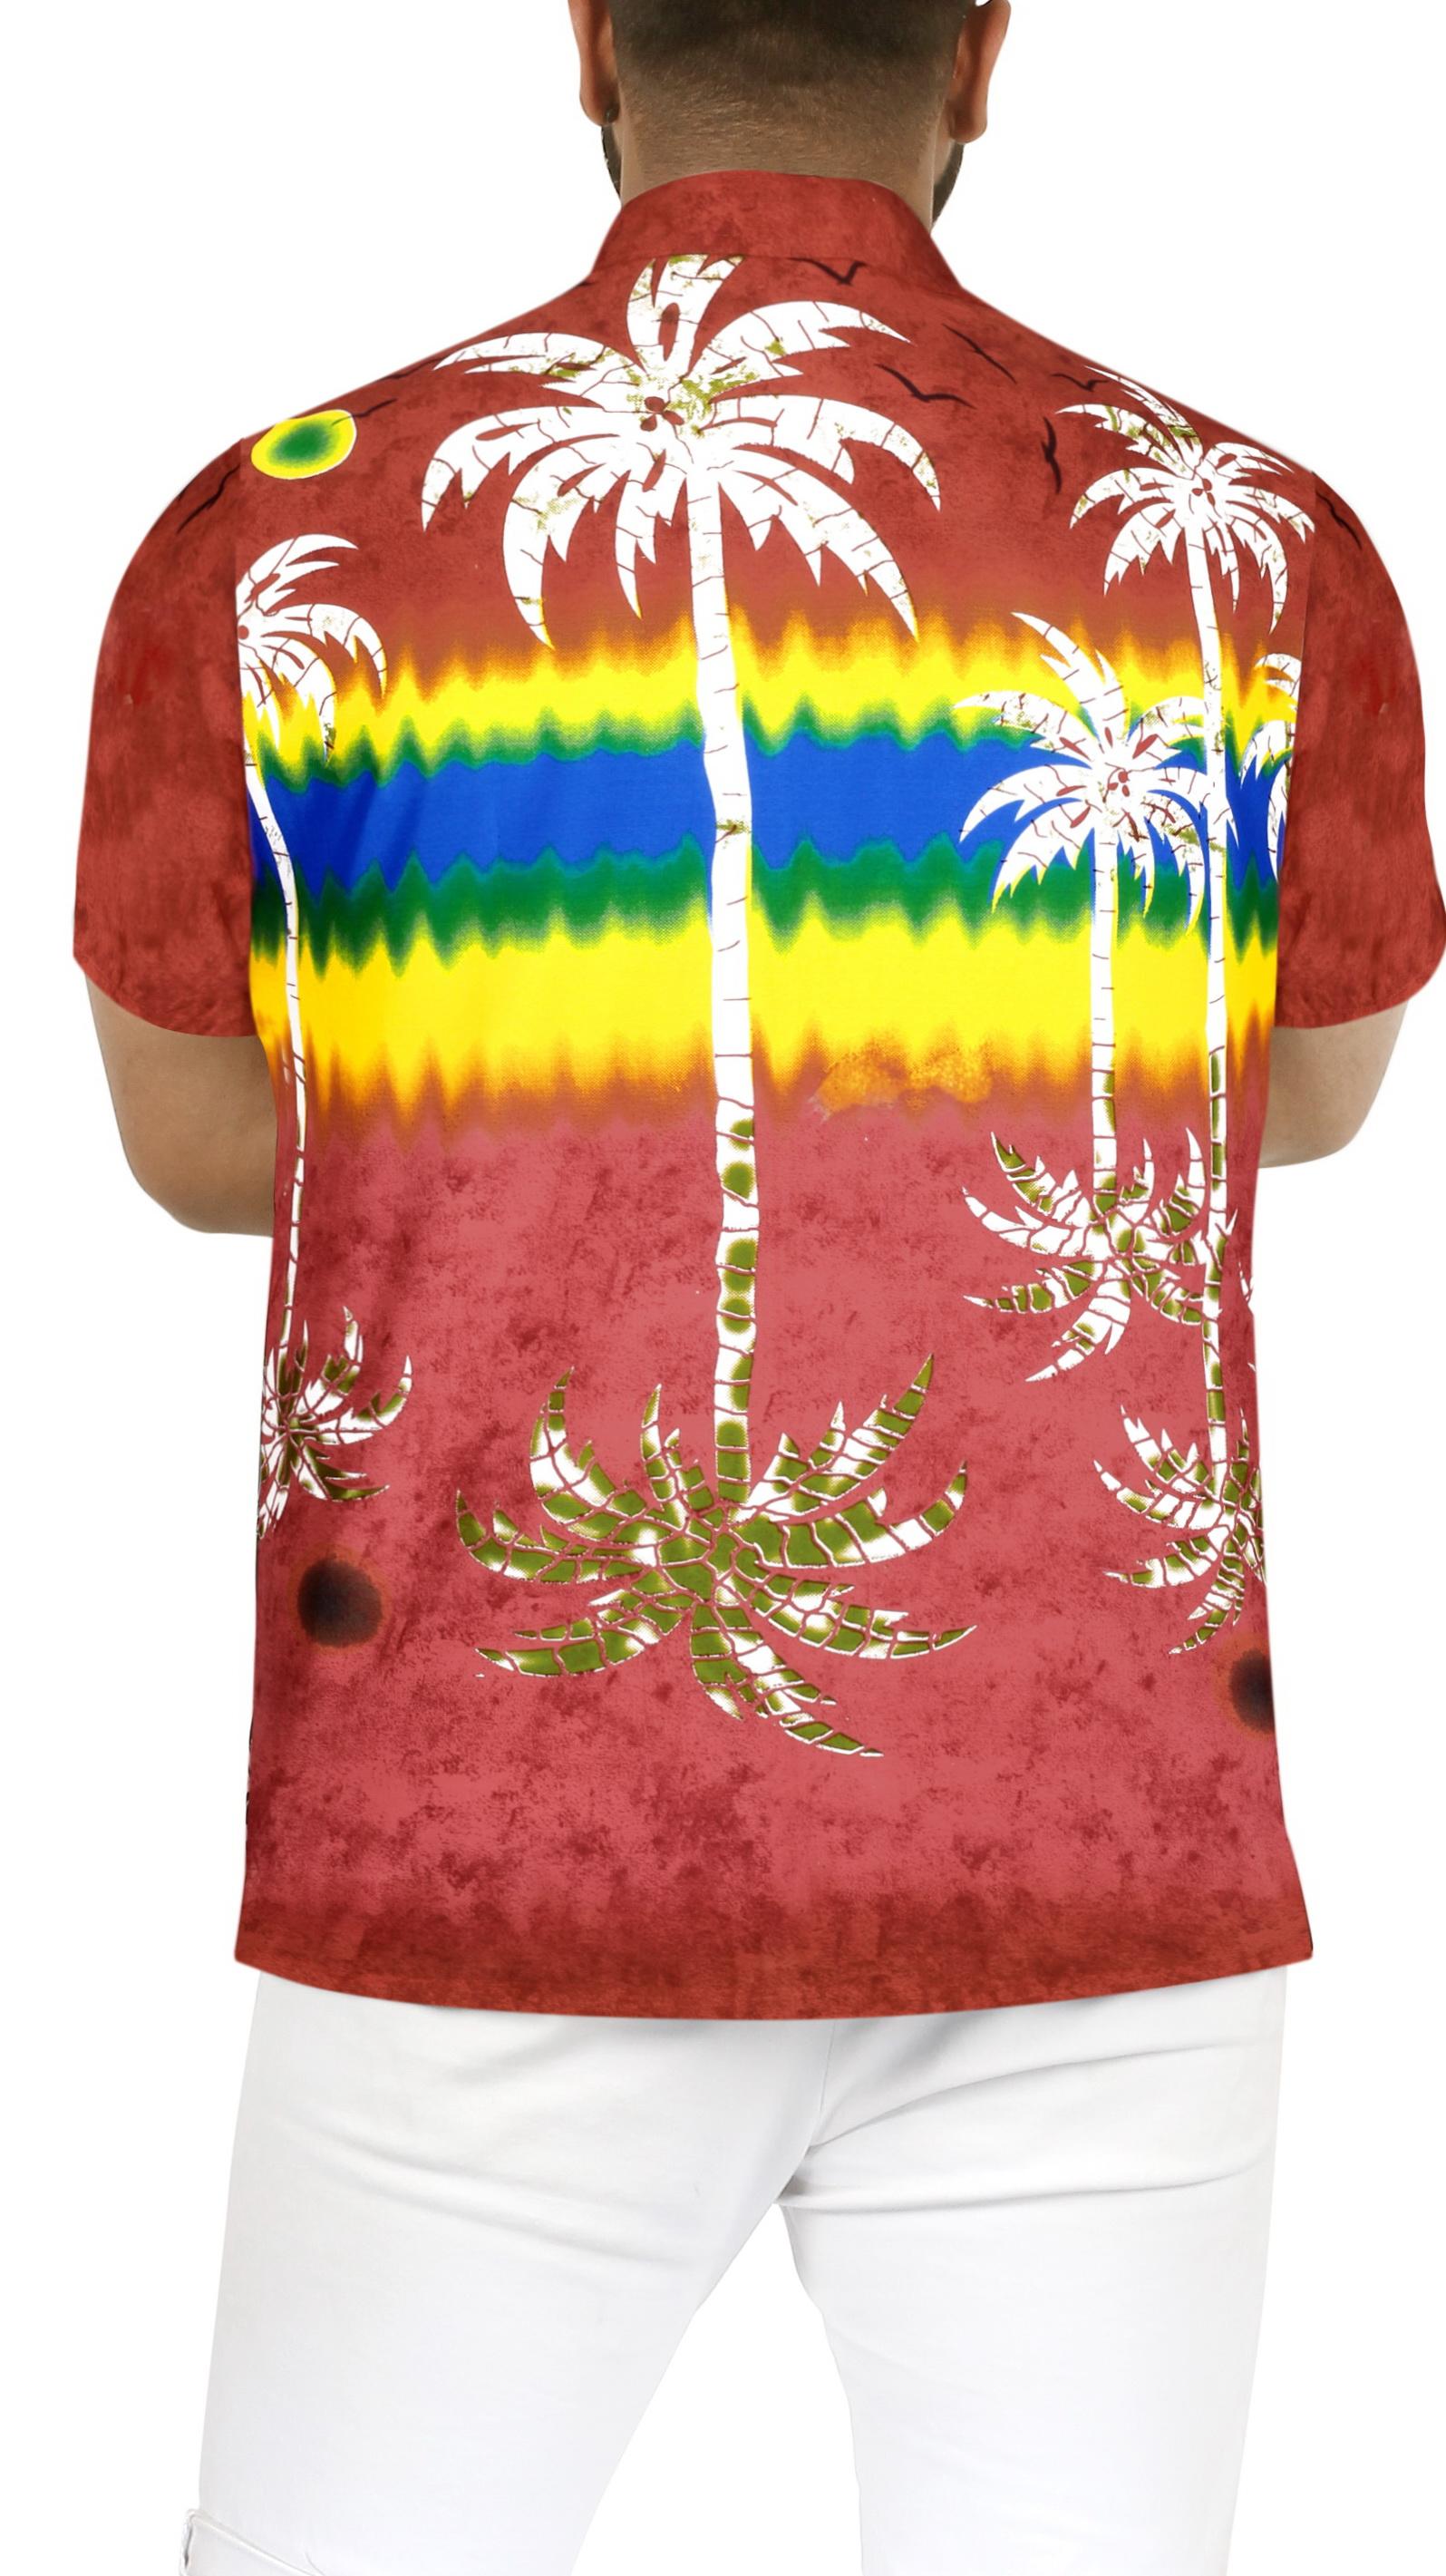 Indexbild 13 - Herren Hibiskus Palme Aloha Hawaii kurzen Ärmeln Knopfleiste Hawaii Shirt